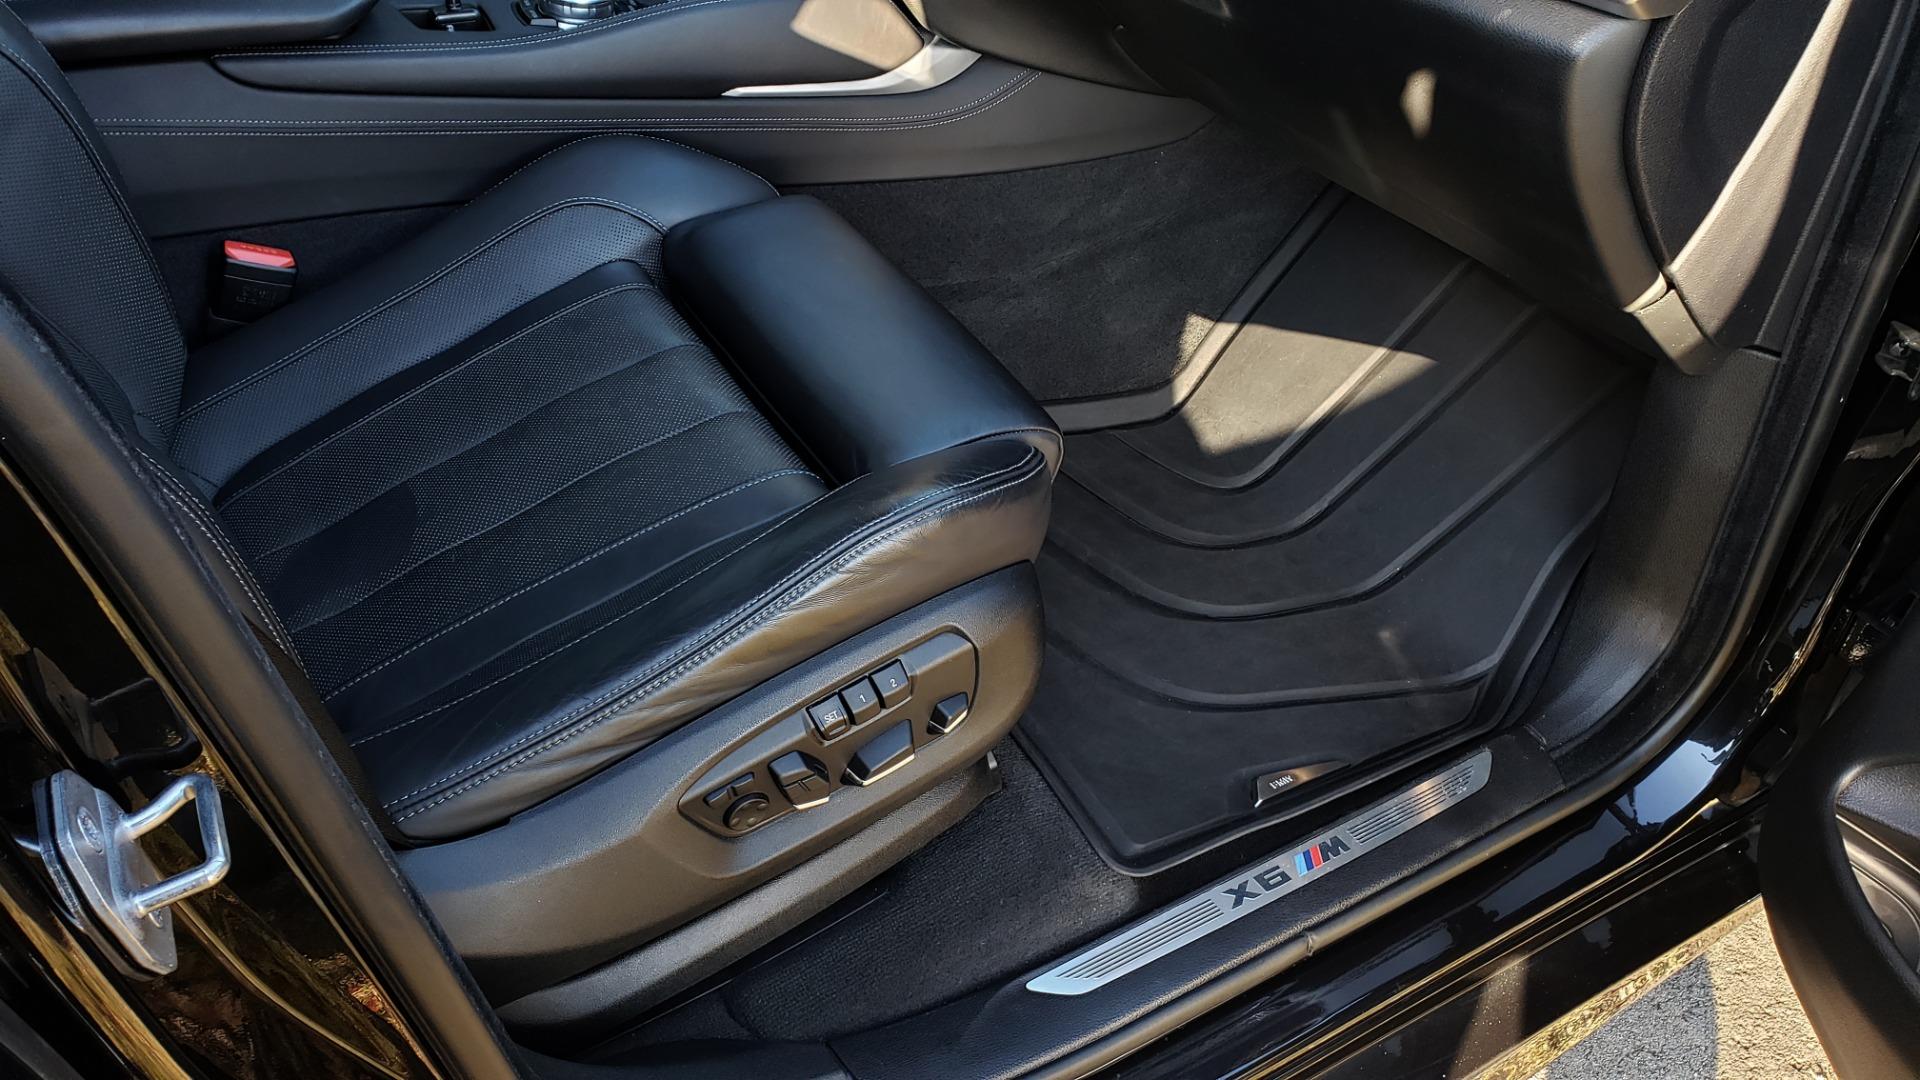 Used 2016 BMW X6 M EXEC PKG / DRVR ASST / NAV / SUNROOF / BLIND SPOT / REARVIEW for sale Sold at Formula Imports in Charlotte NC 28227 20